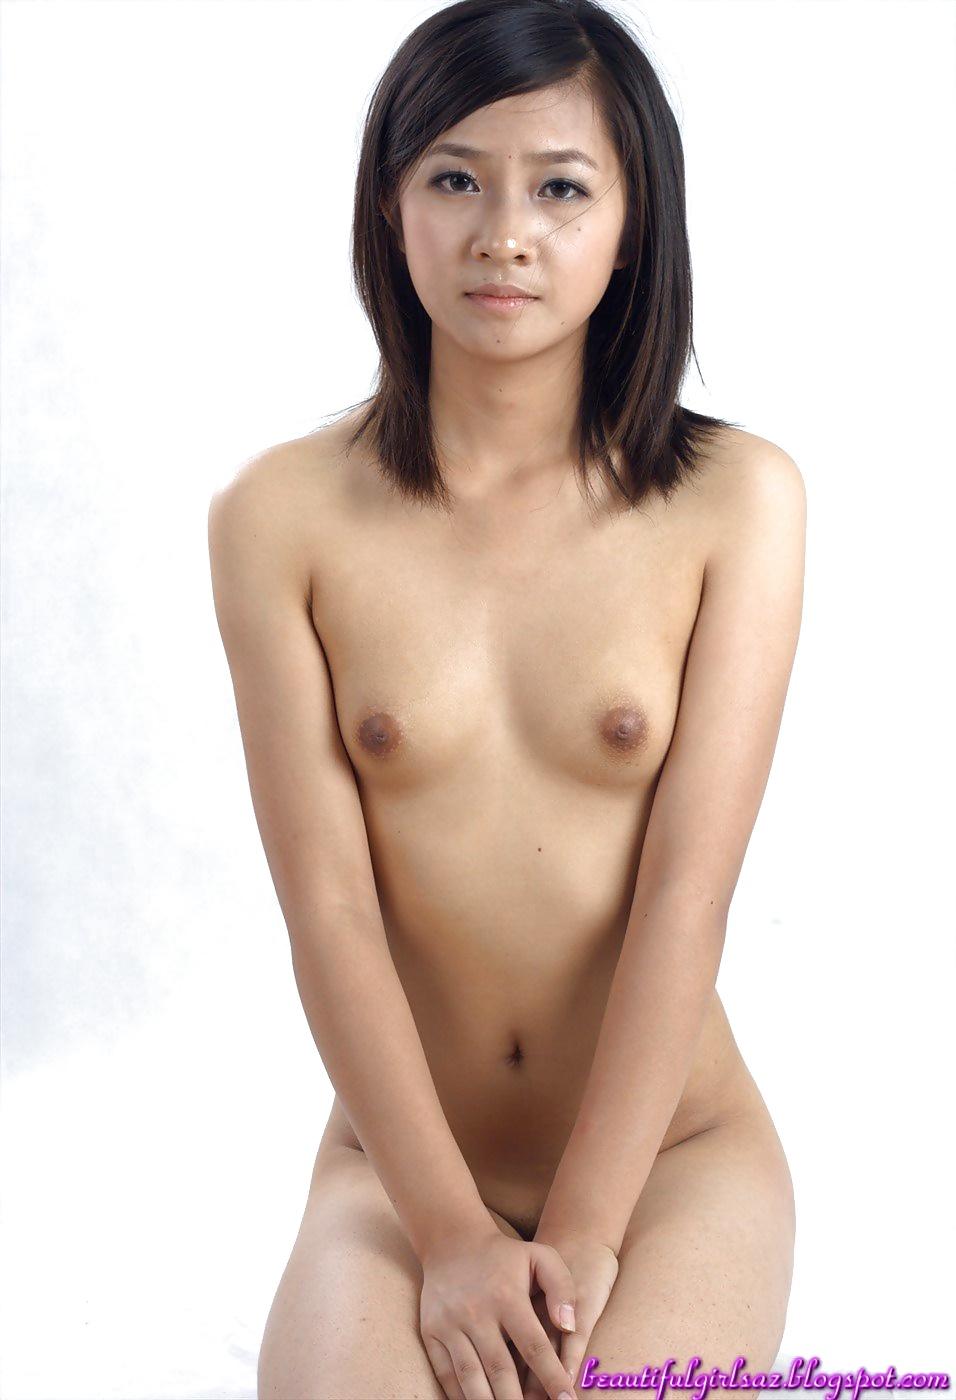 Nude taiwanese girls